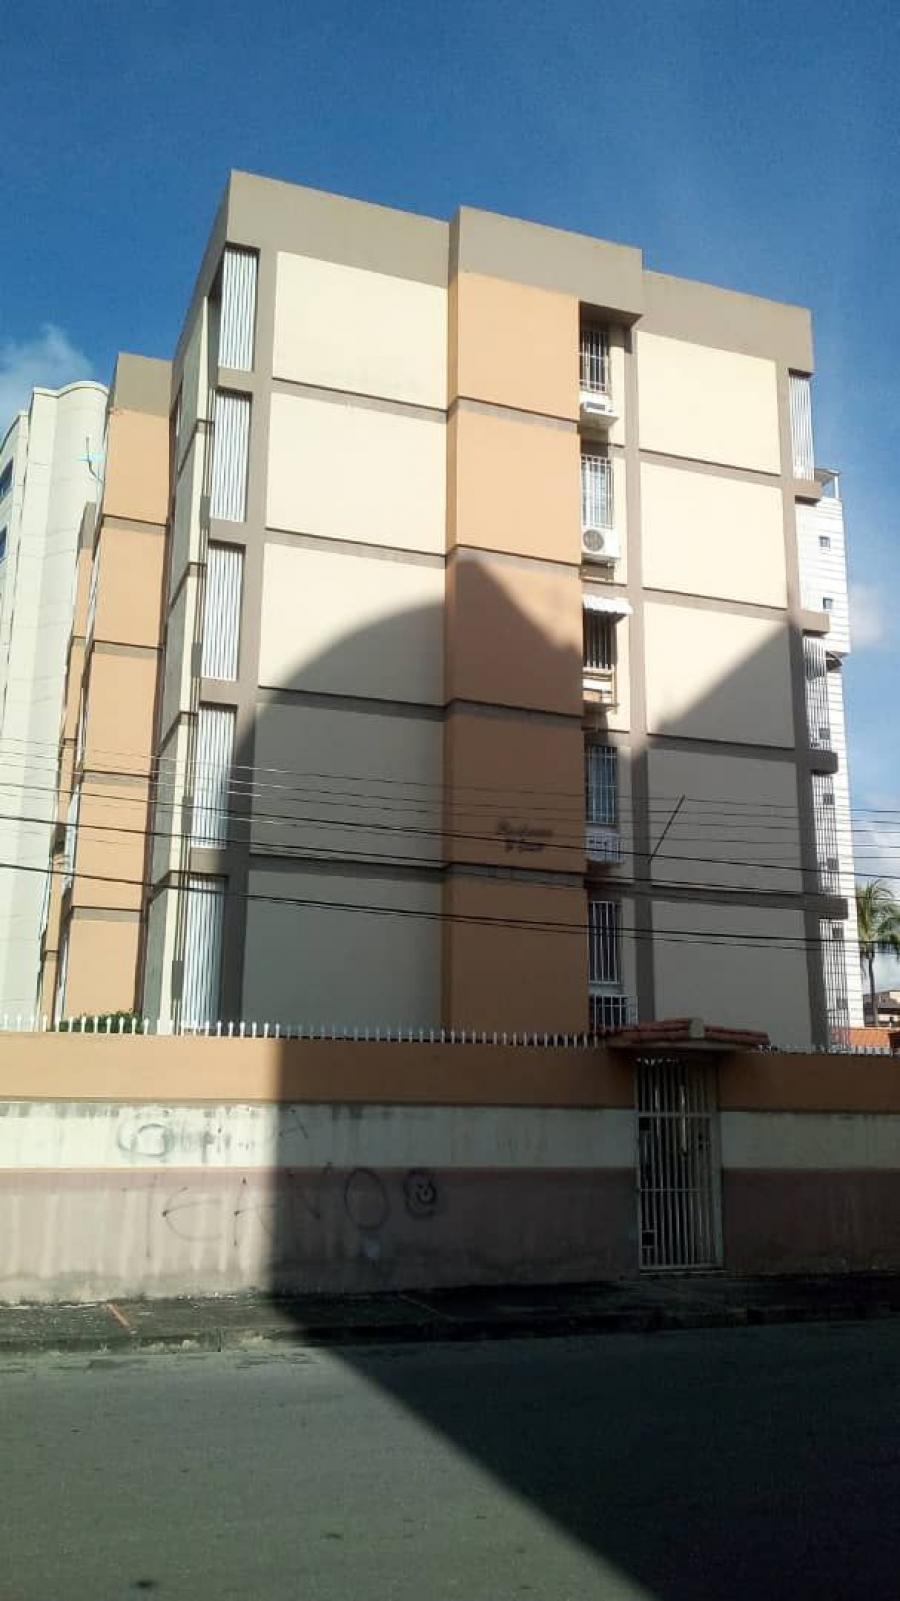 Foto Apartamento en Venta en Girardot, Maracay, Aragua - U$D 45.000 - APV137181 - BienesOnLine